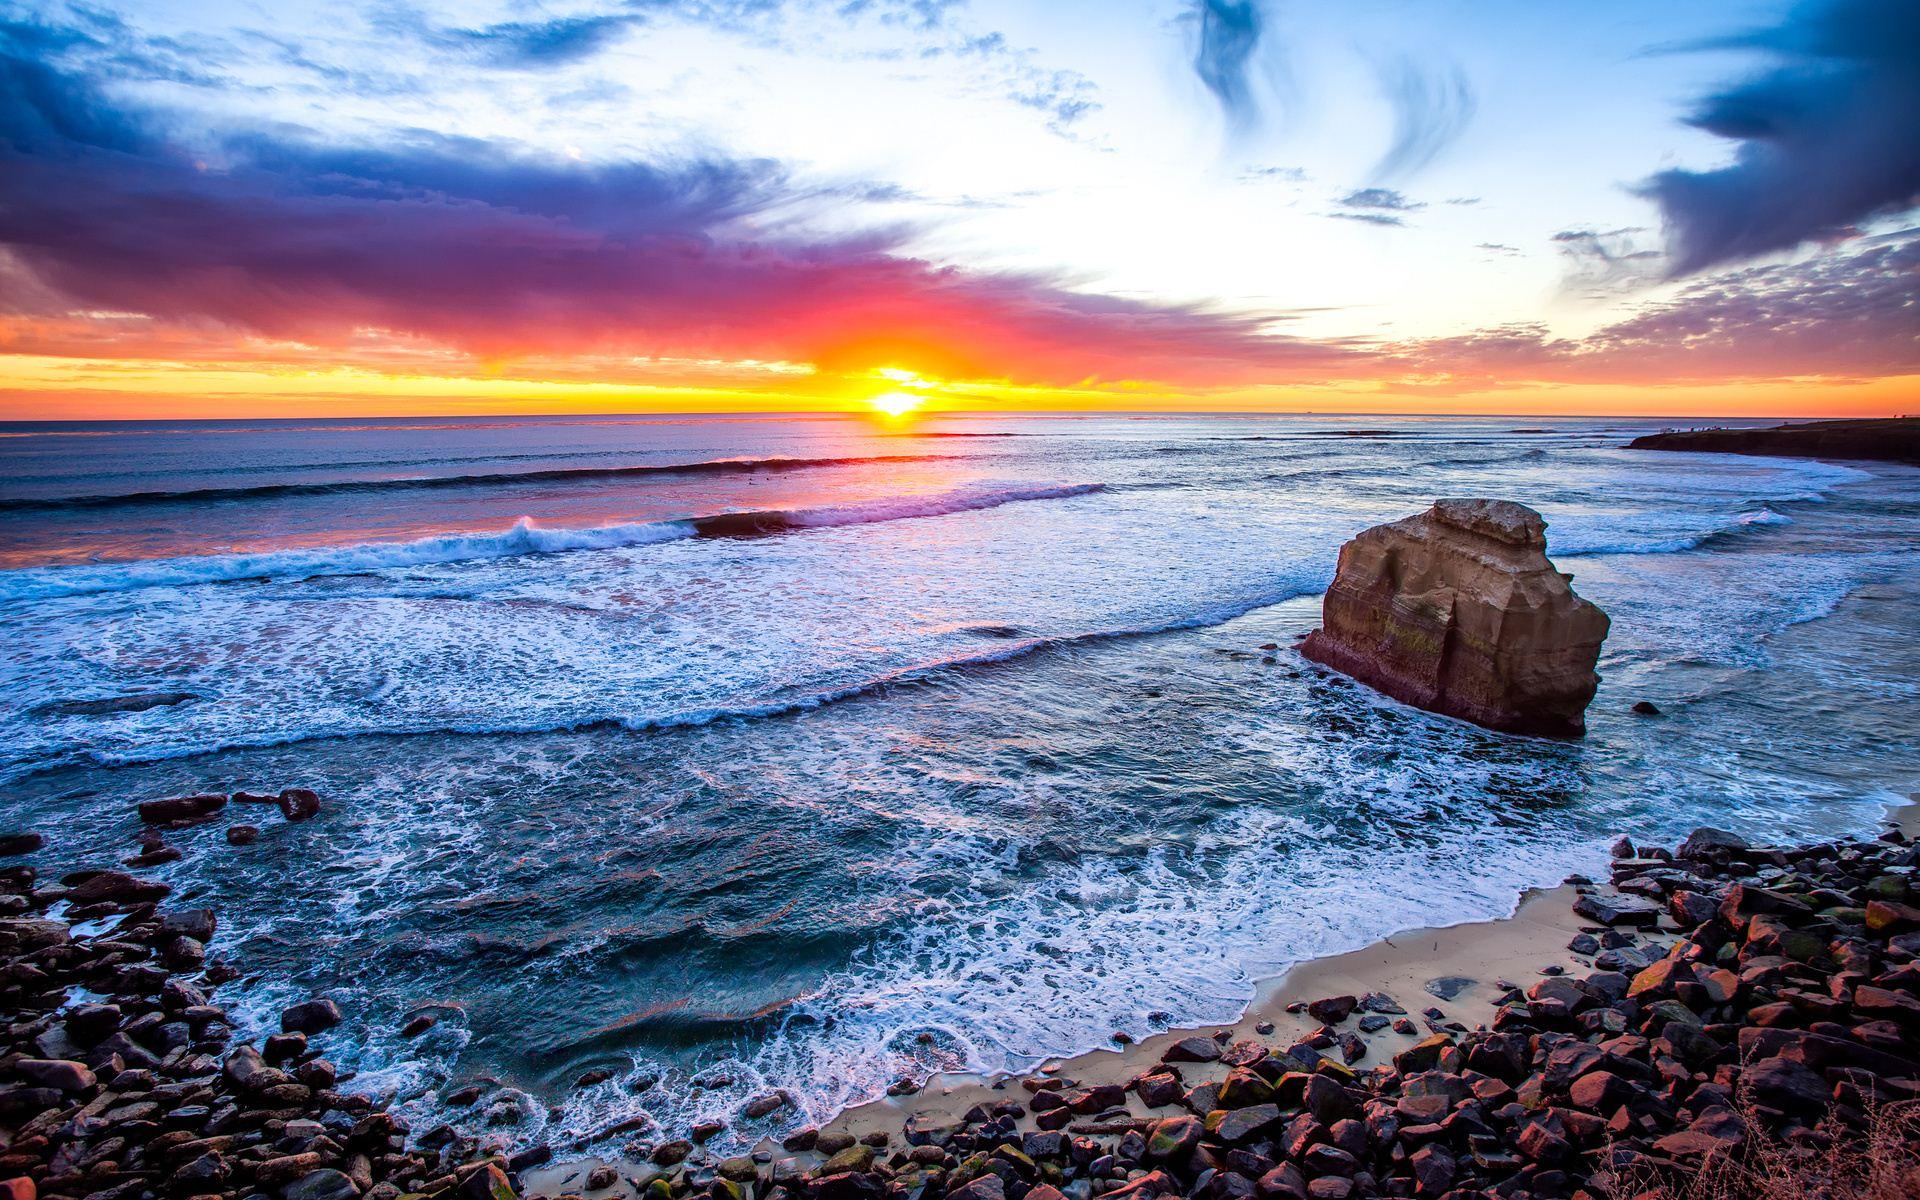 15 gorgeous hd sunset wallpapers - Cali wallpaper hd ...